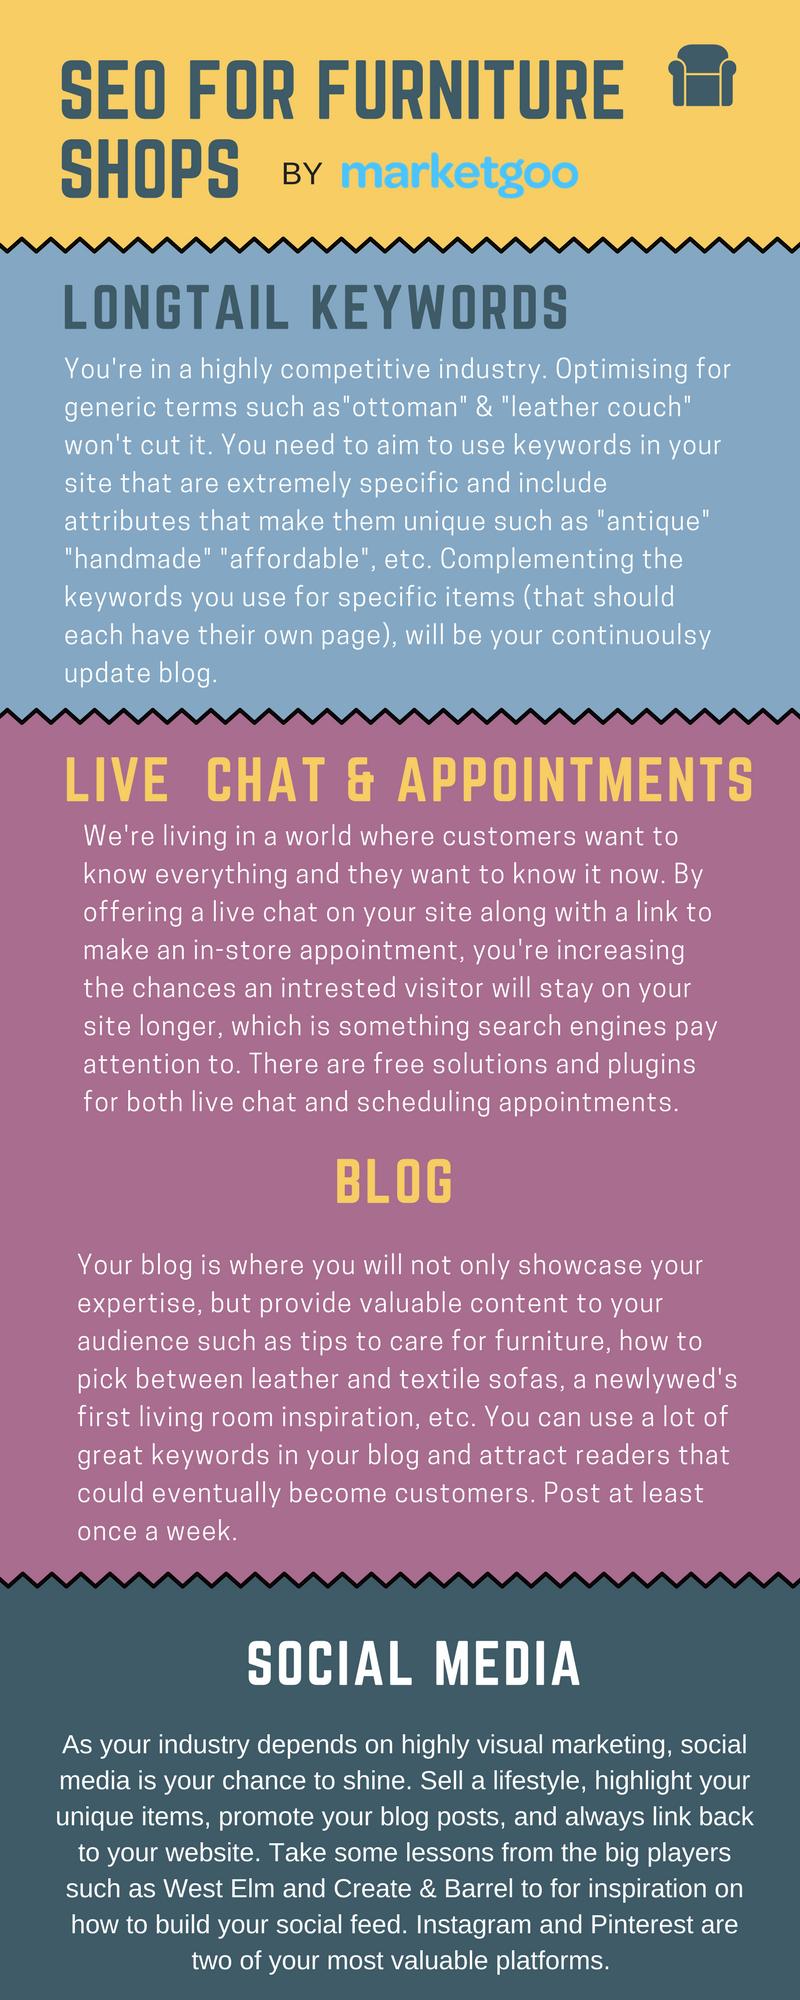 seo for furniture shops